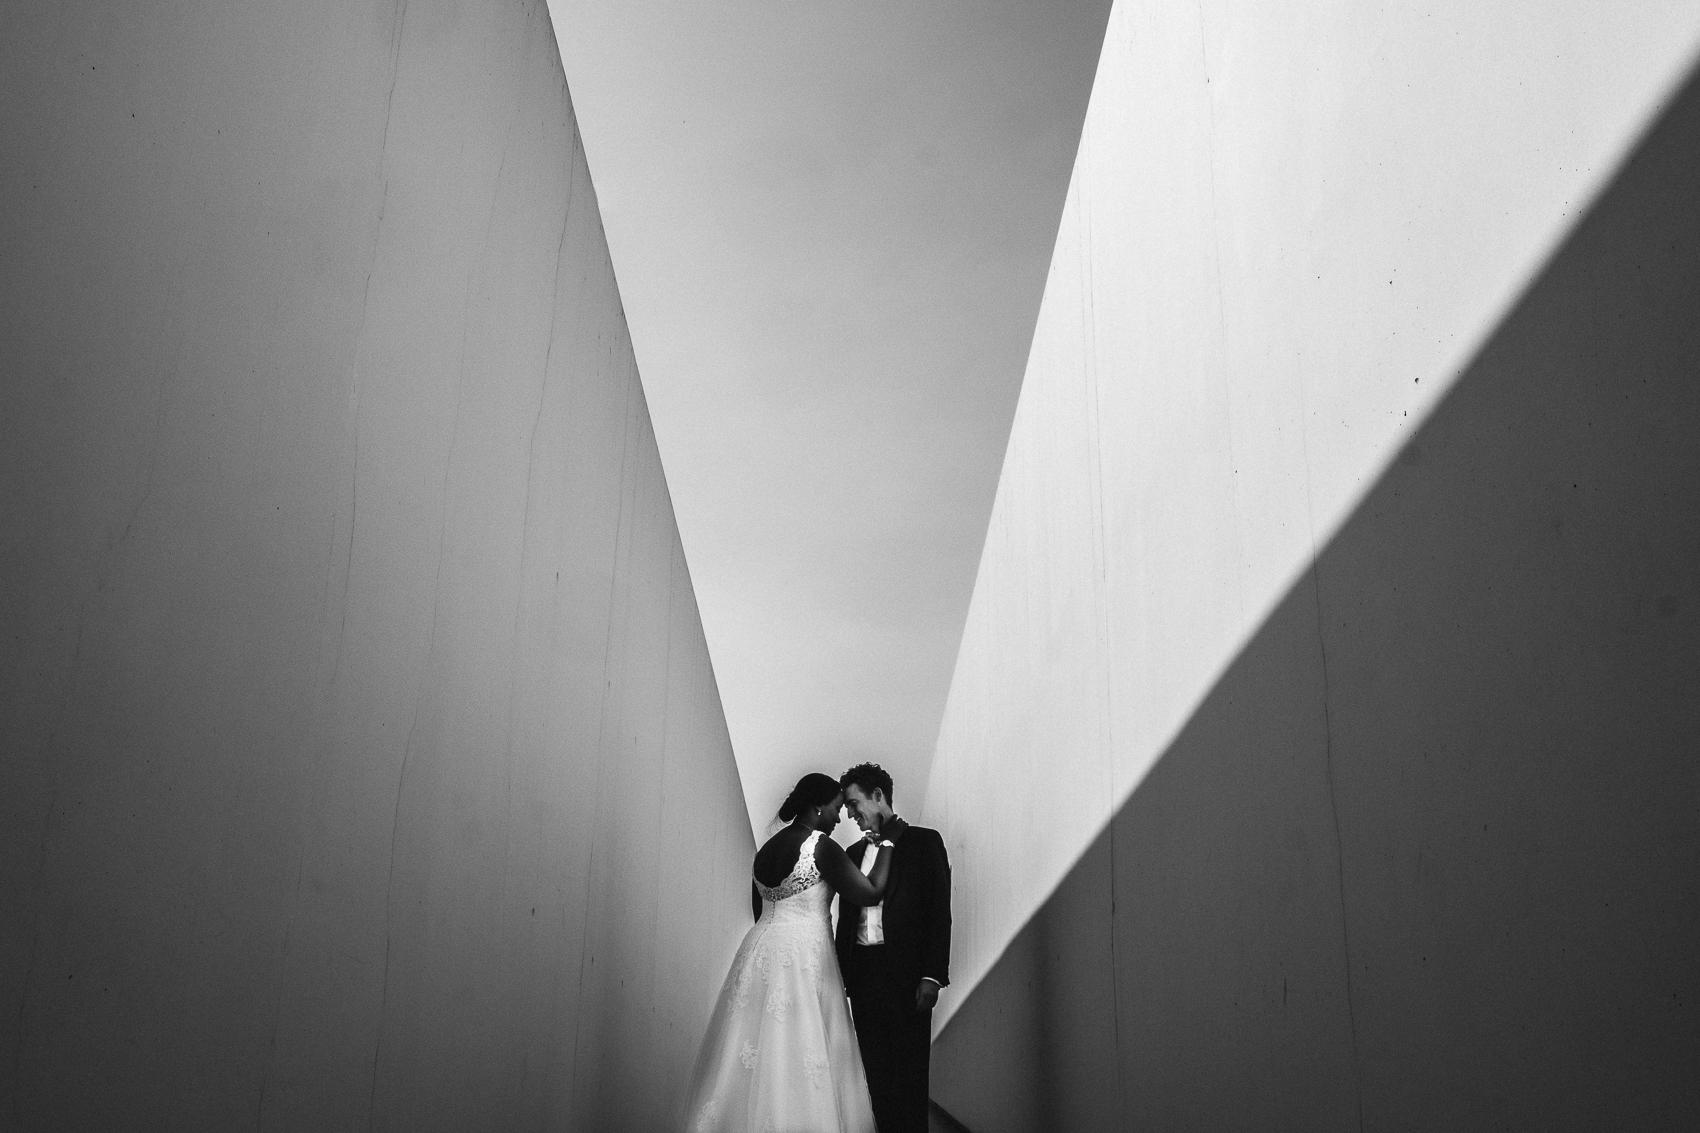 iso800 - trouwfotograaf Grace en Stijn -74.jpg